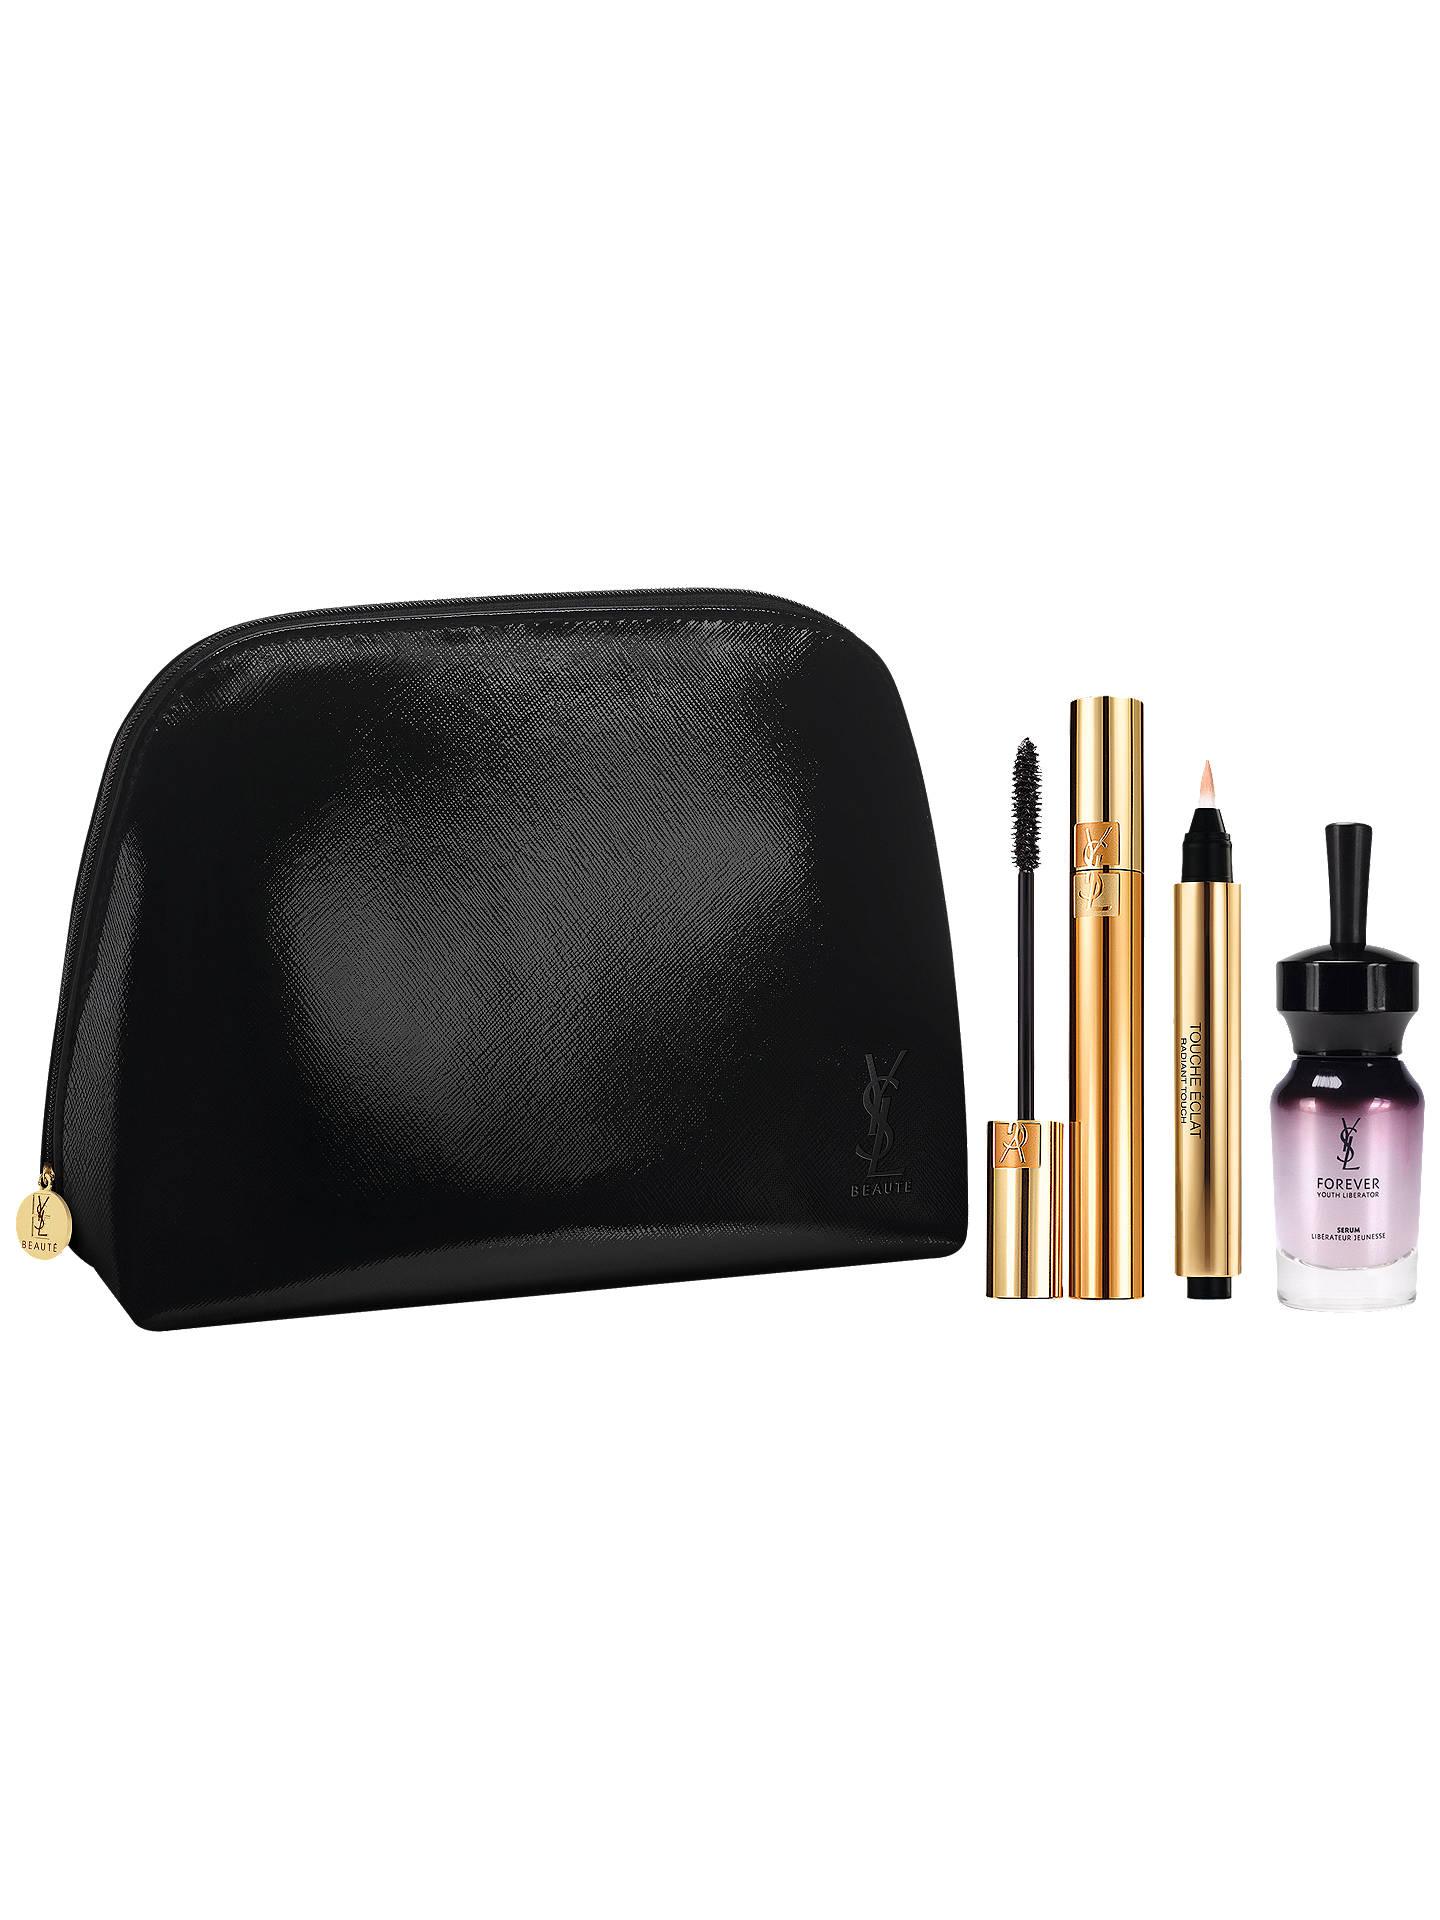 4056b1c9af84 Yves Saint Laurent Touche Éclat and Mascara Makeup Gift Set at John ...